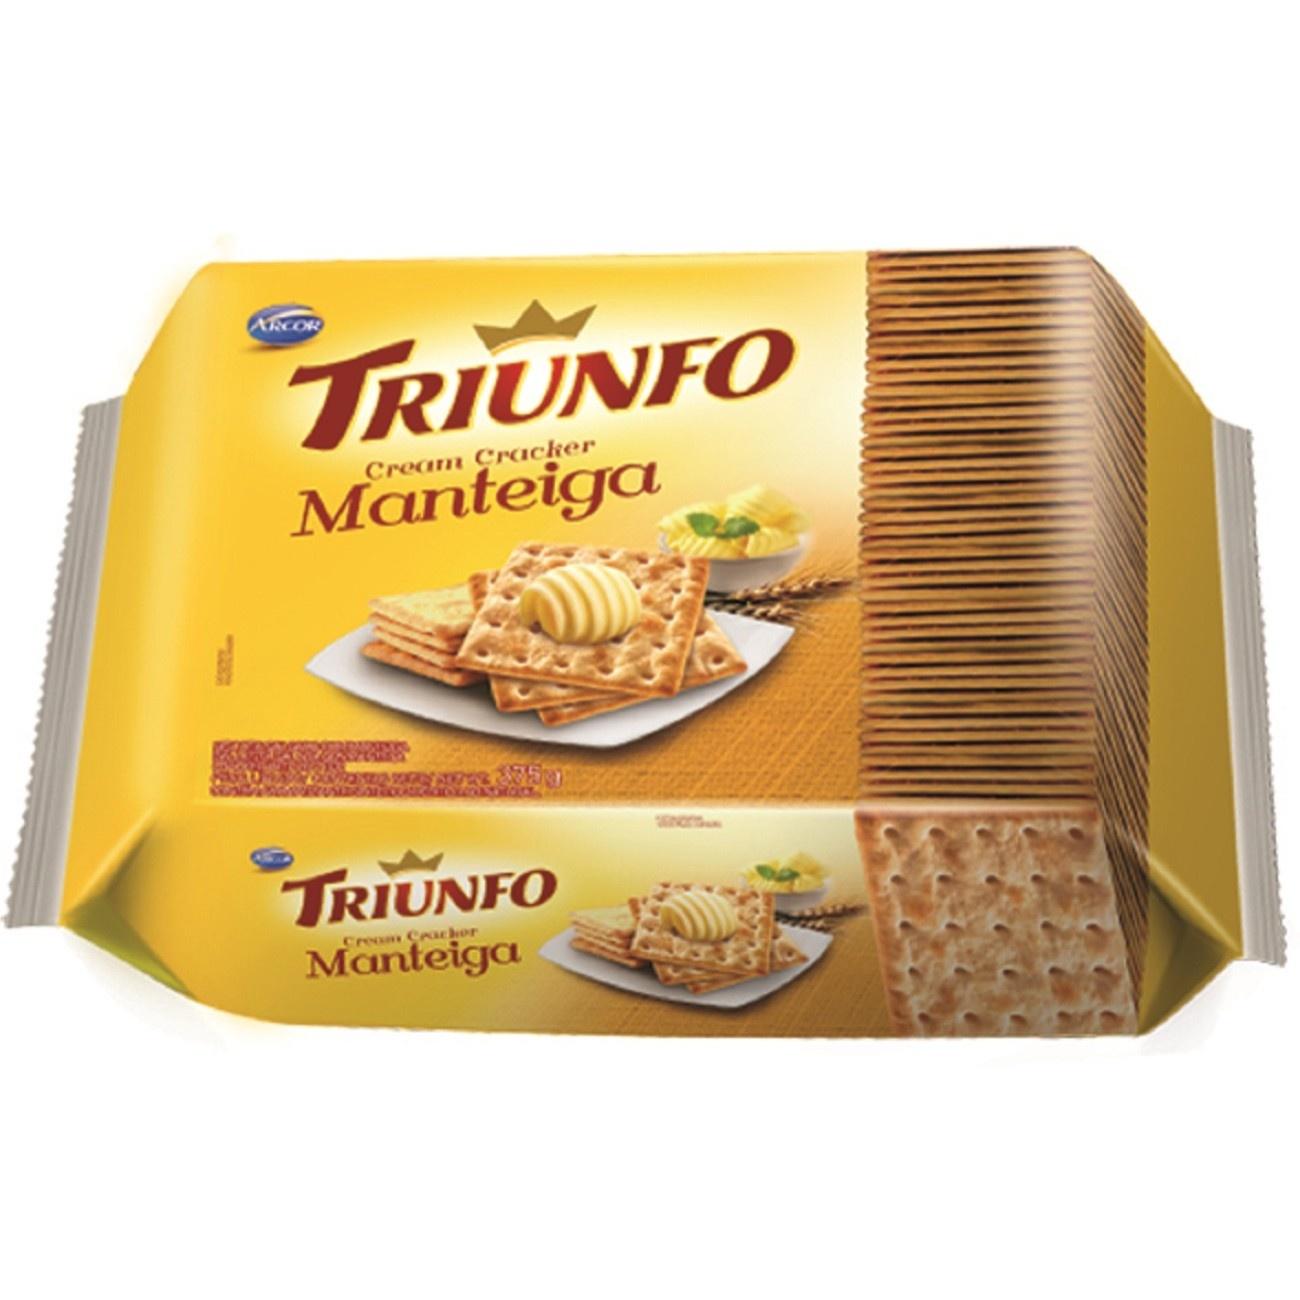 Biscoito Triunfo Cream Cracker Manteiga 375g Multipack